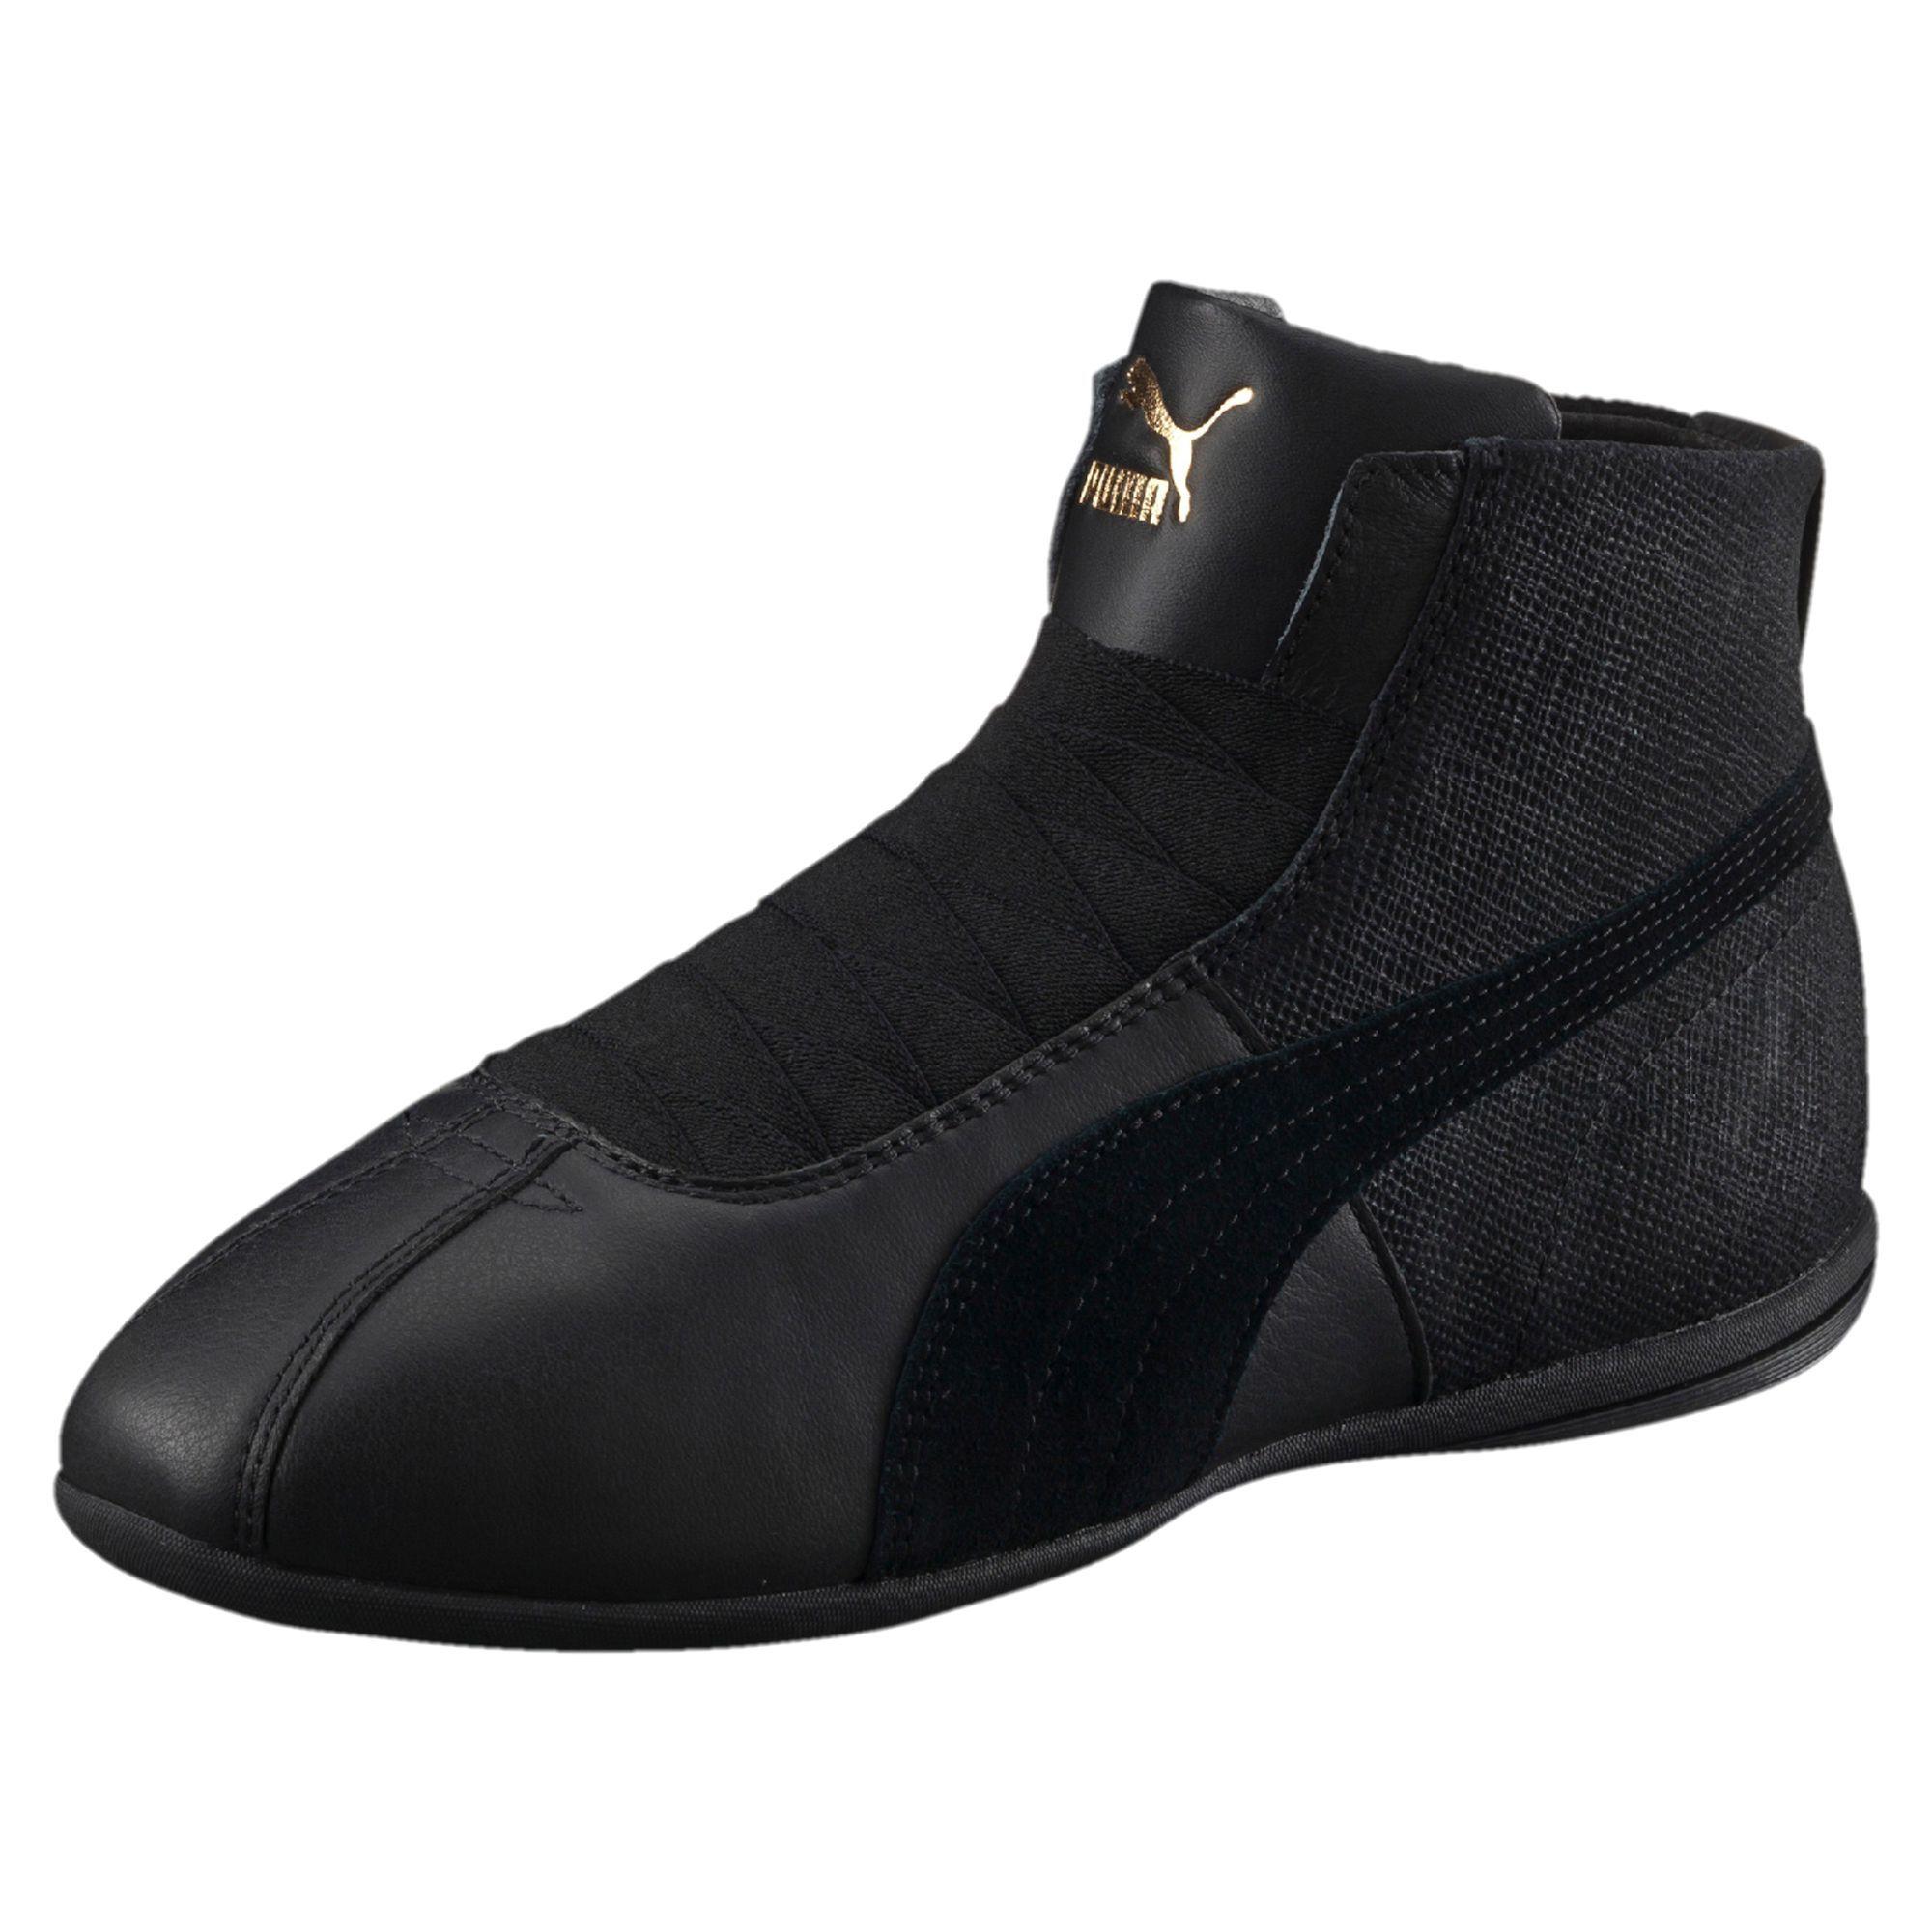 chaussure montante eskiva mid remaster pour femme | mode